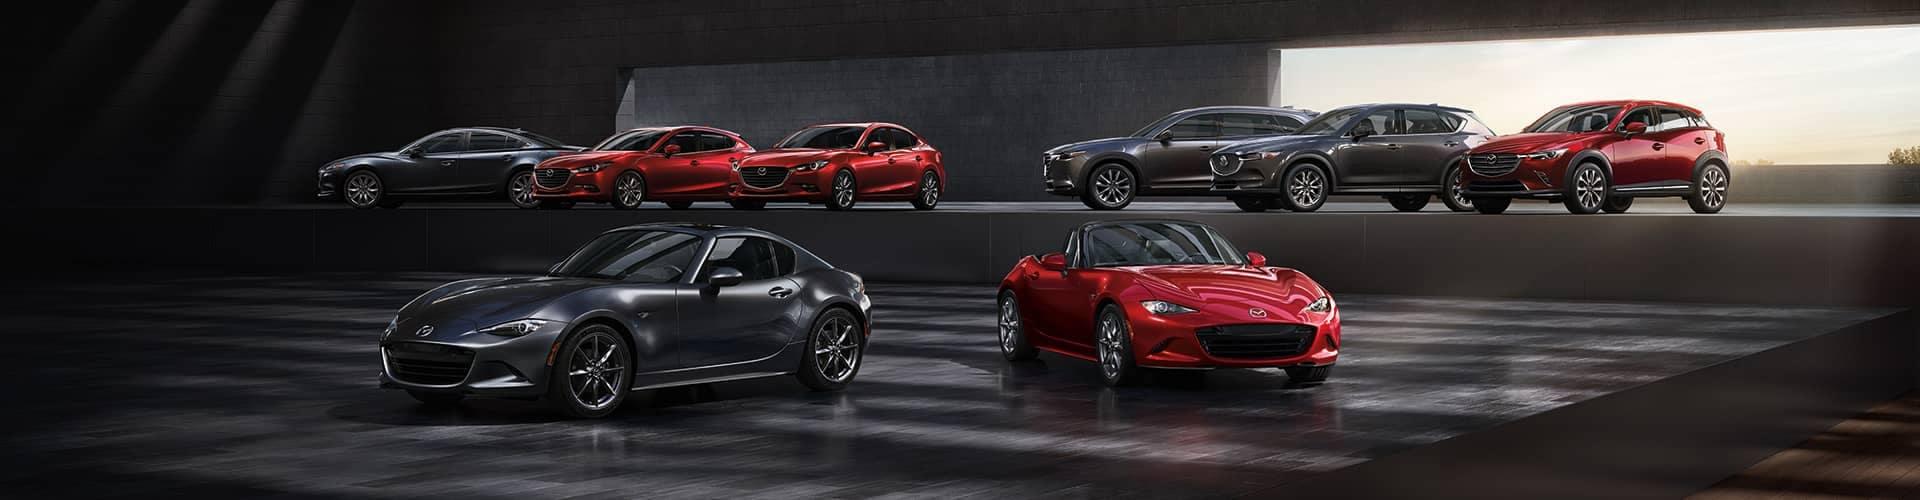 Mazda Model Lineup